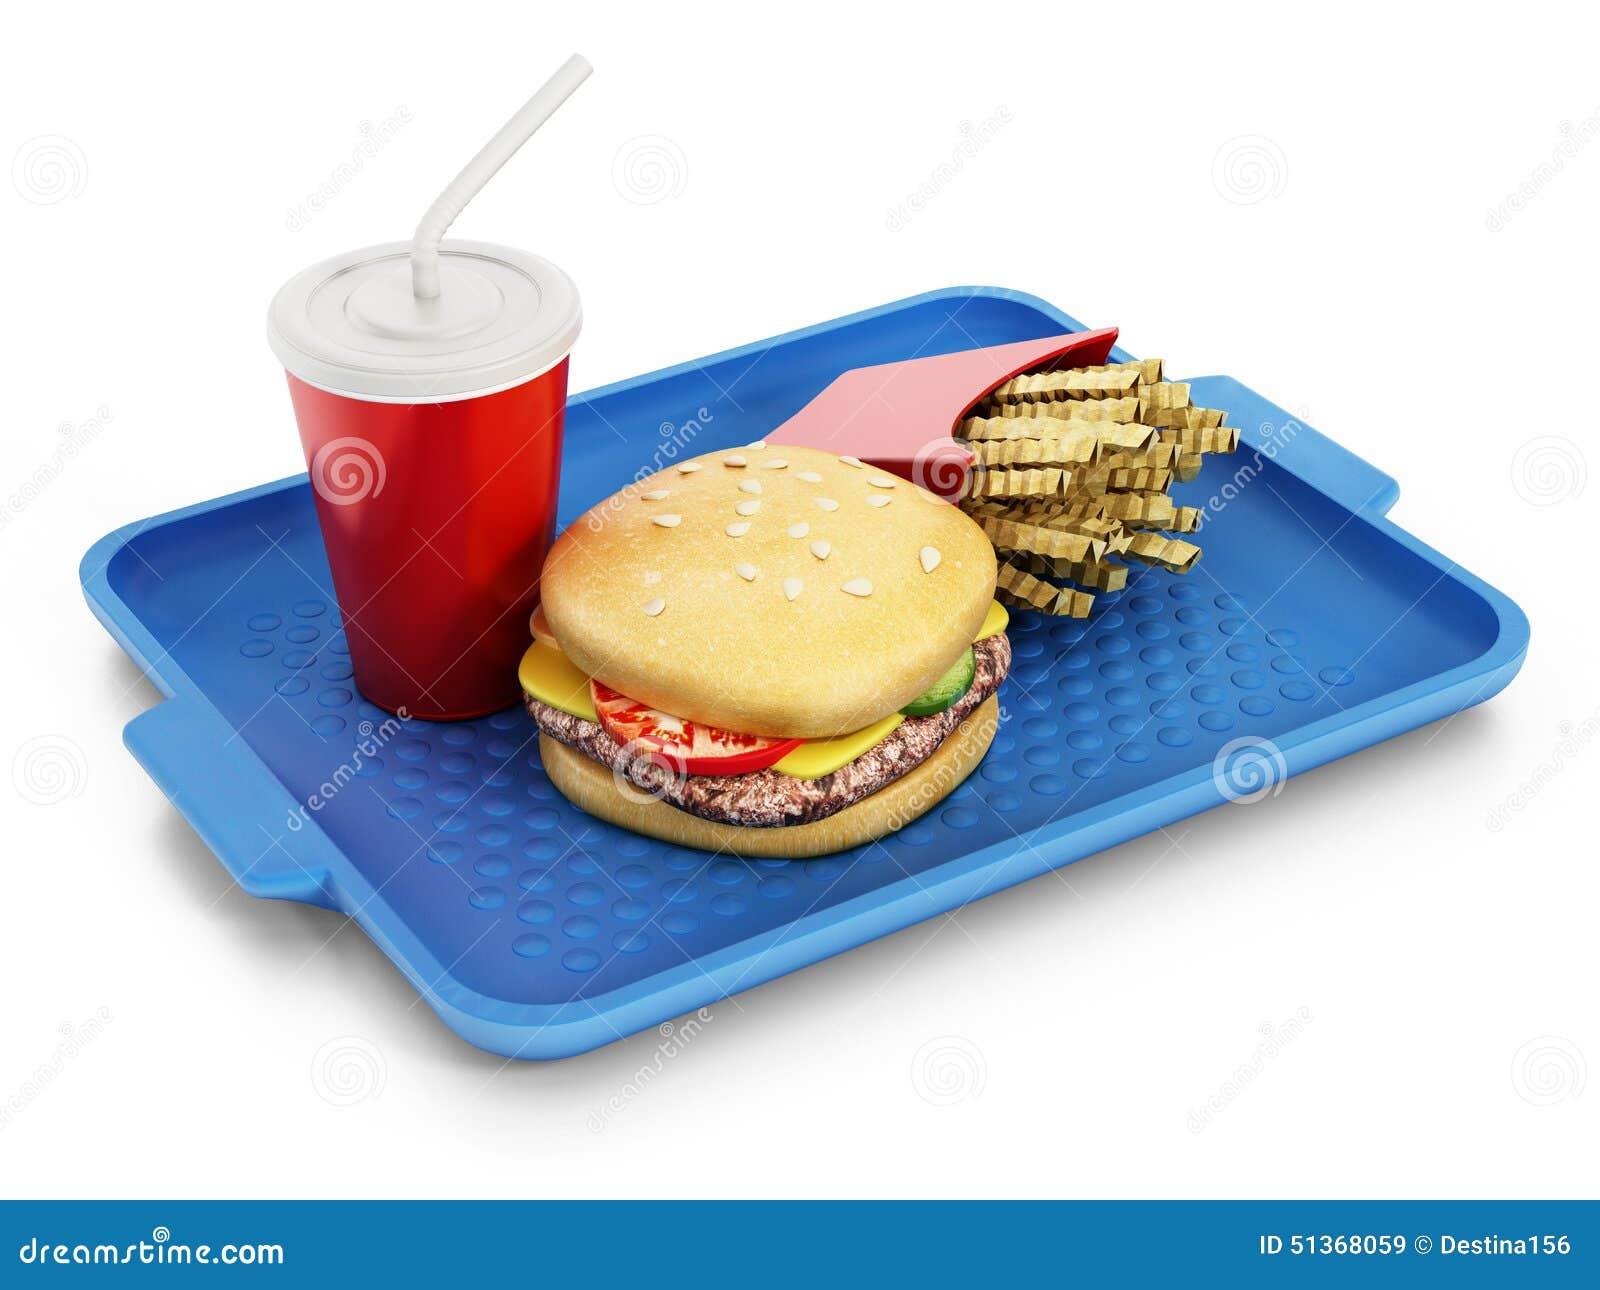 Fast Food Bag Tray